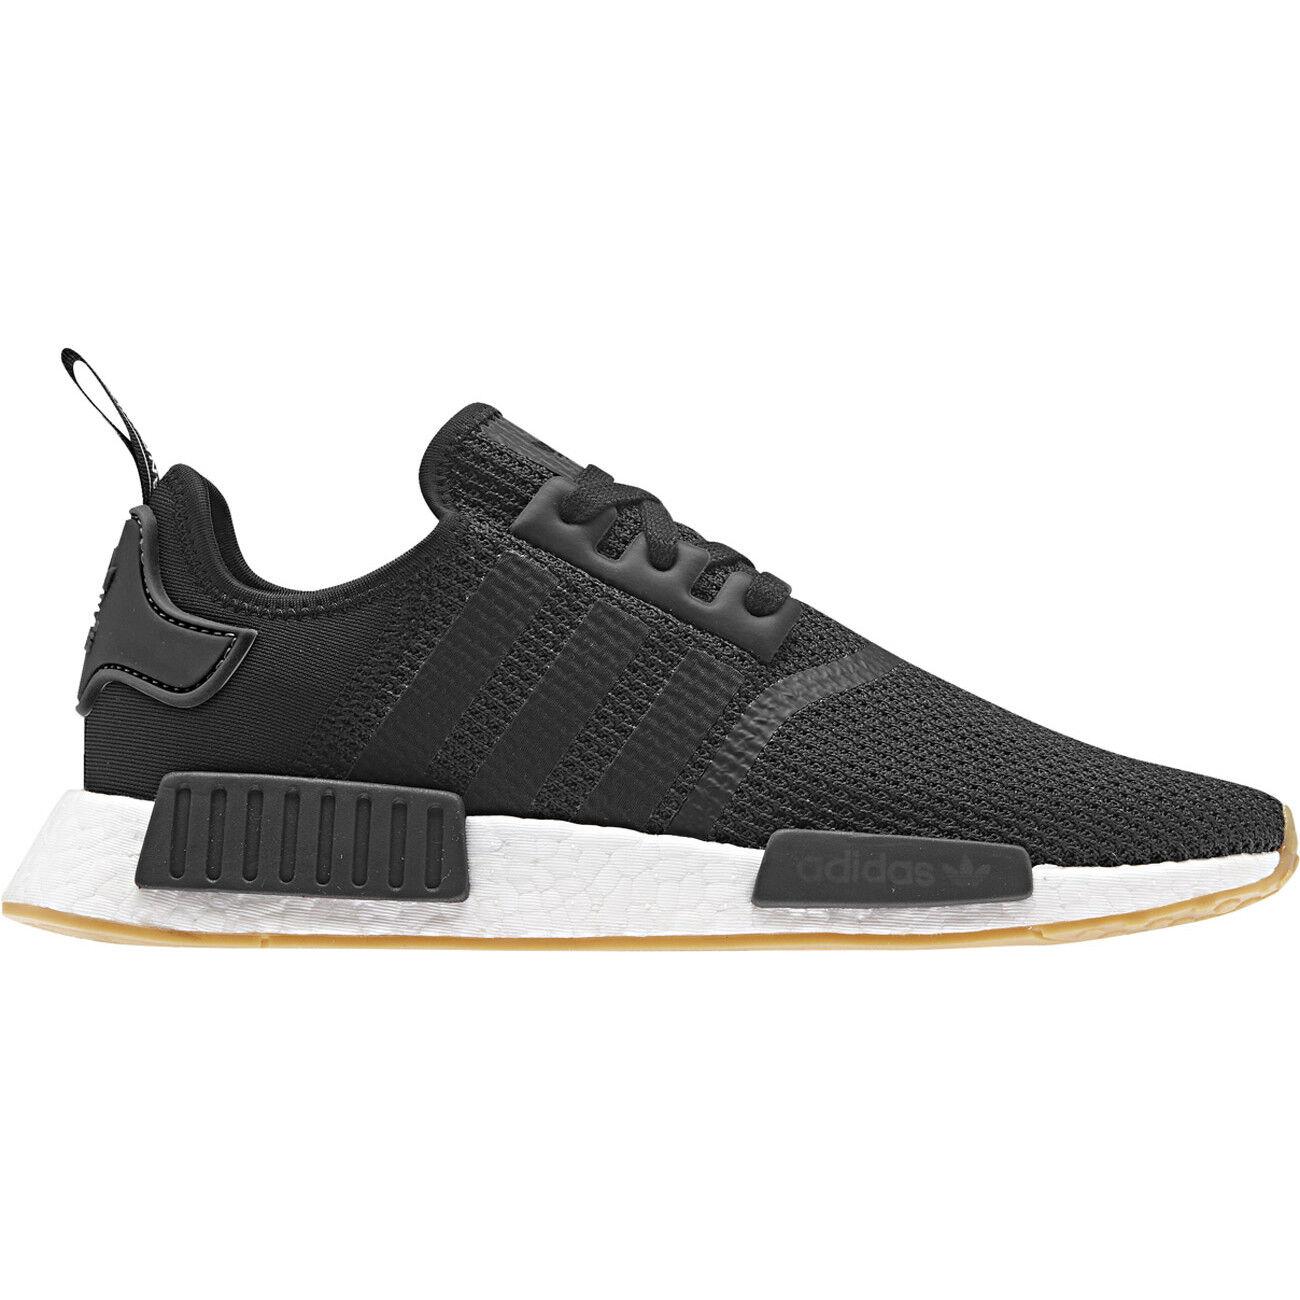 Adidas Originals Hommes Sneaker Sneaker Sneaker nmd_r1 4e1ab2